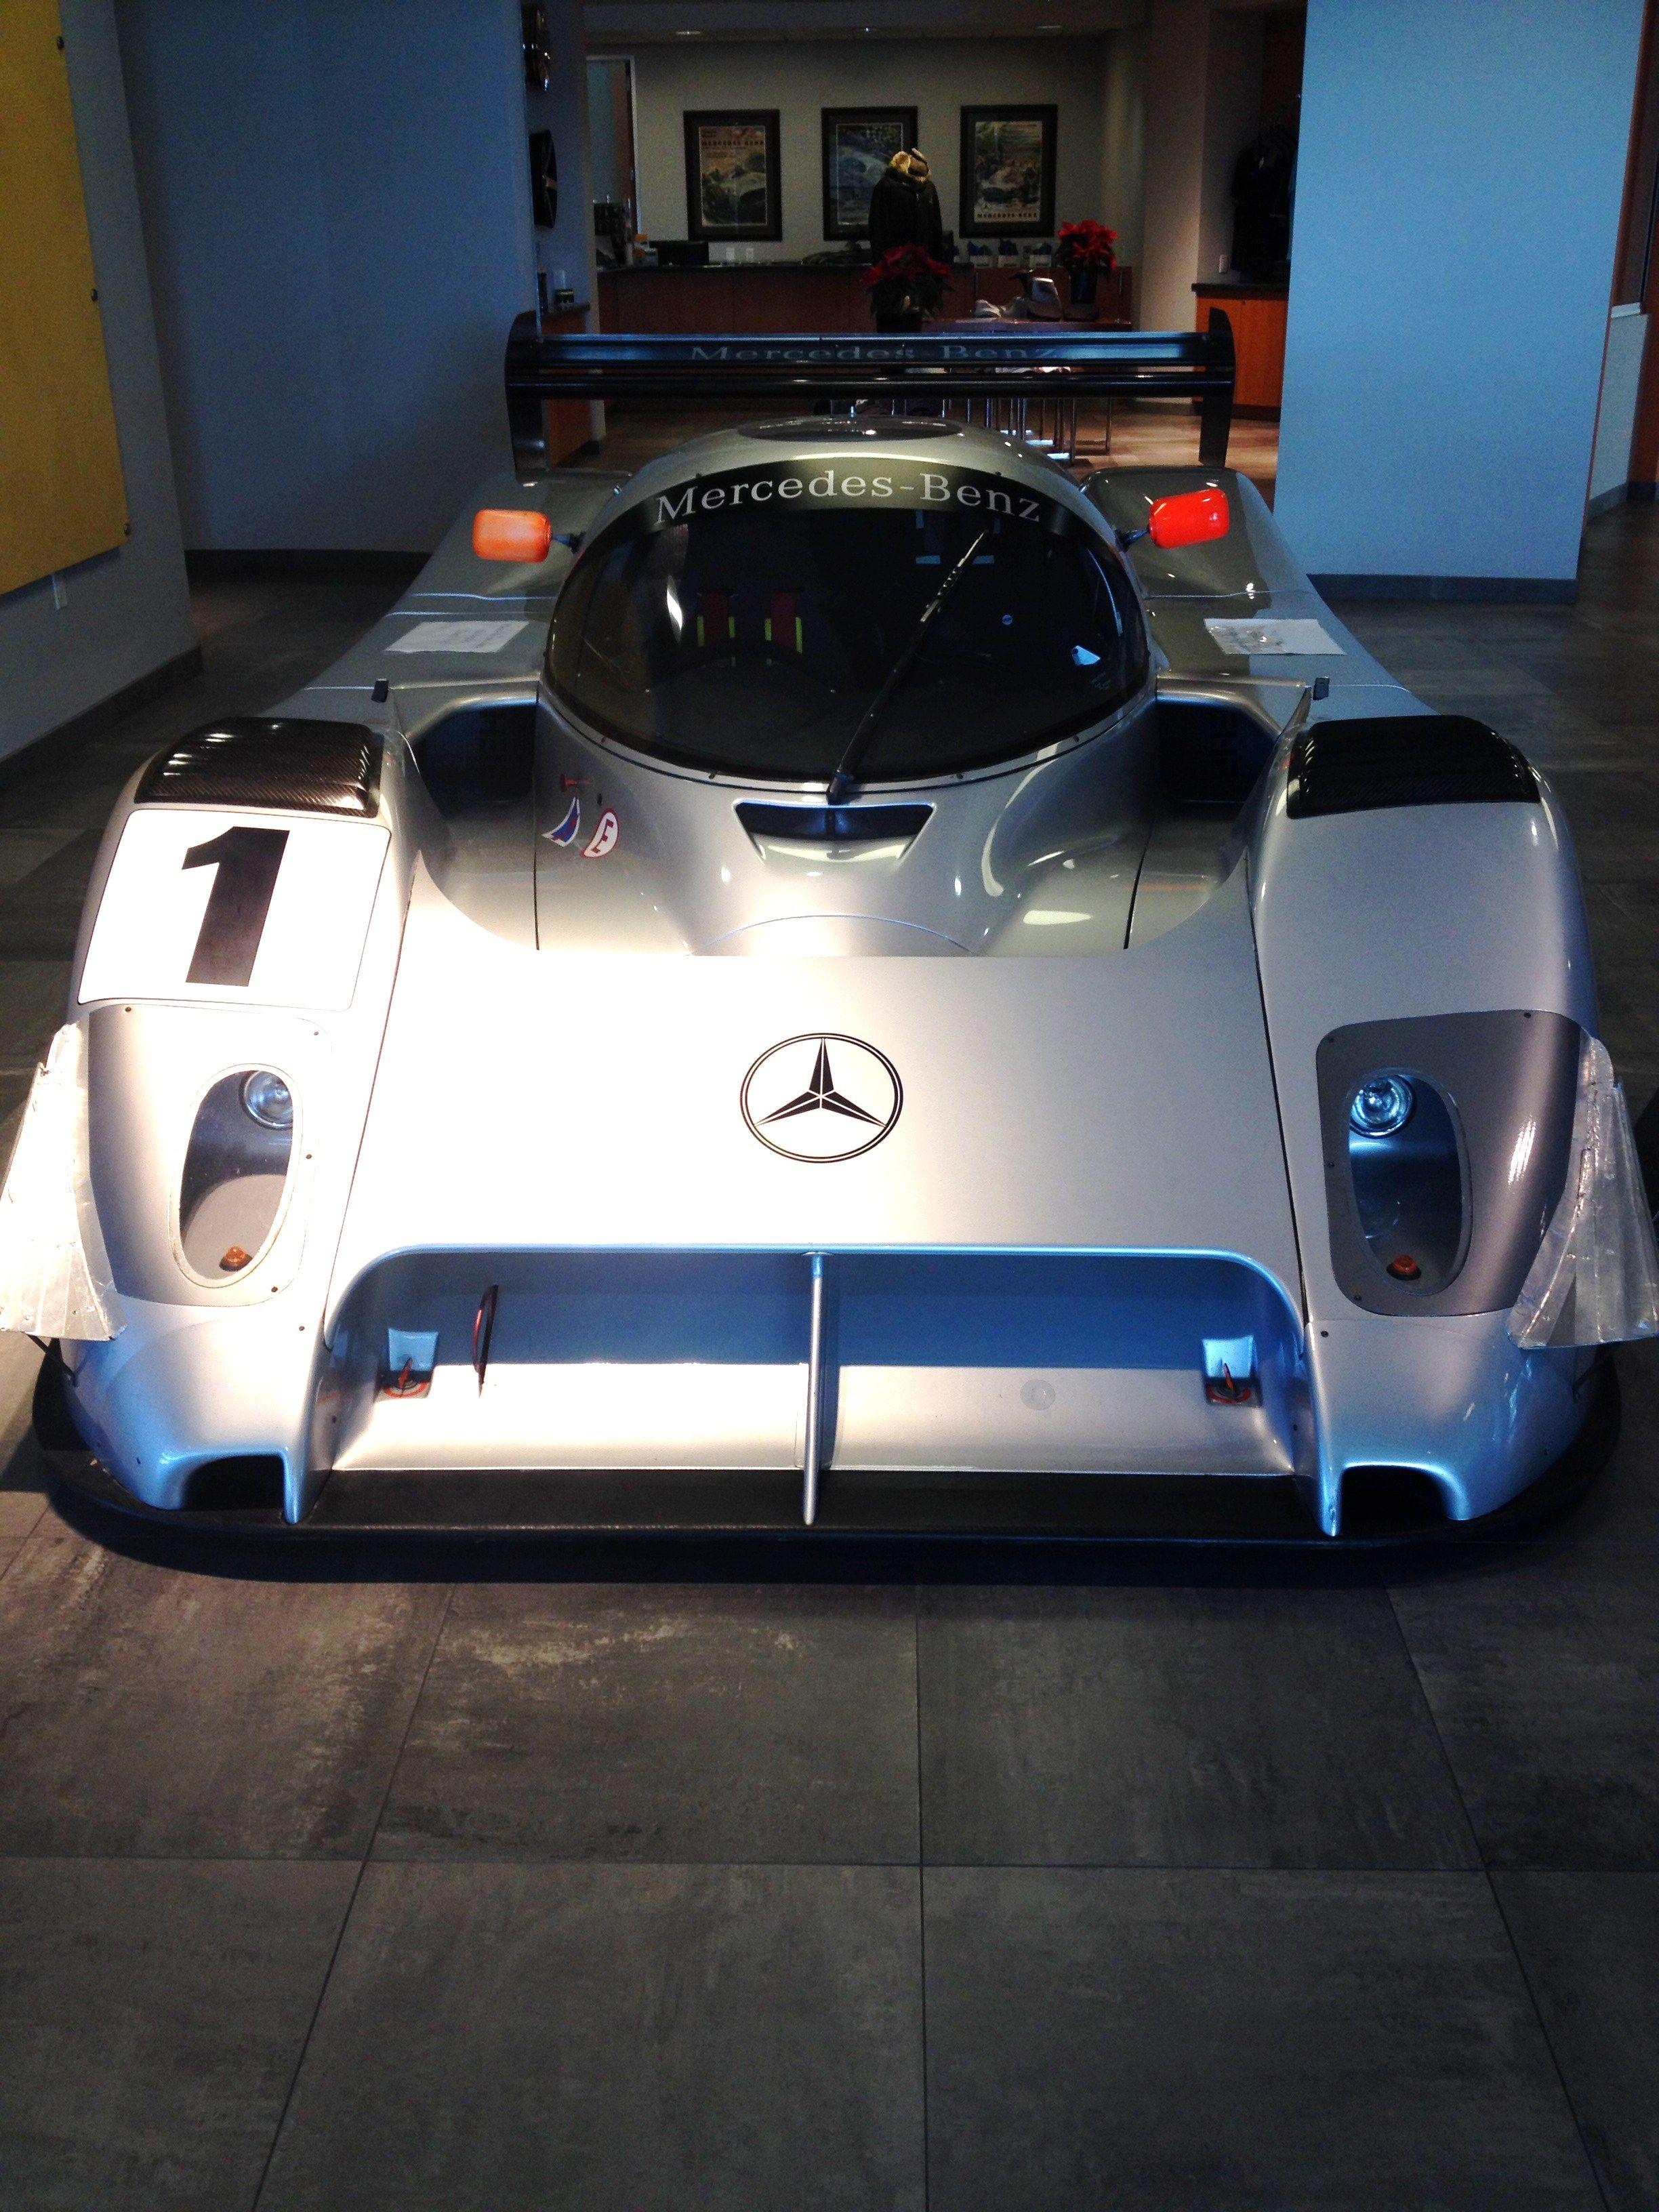 Mercedes Benz Race Car.